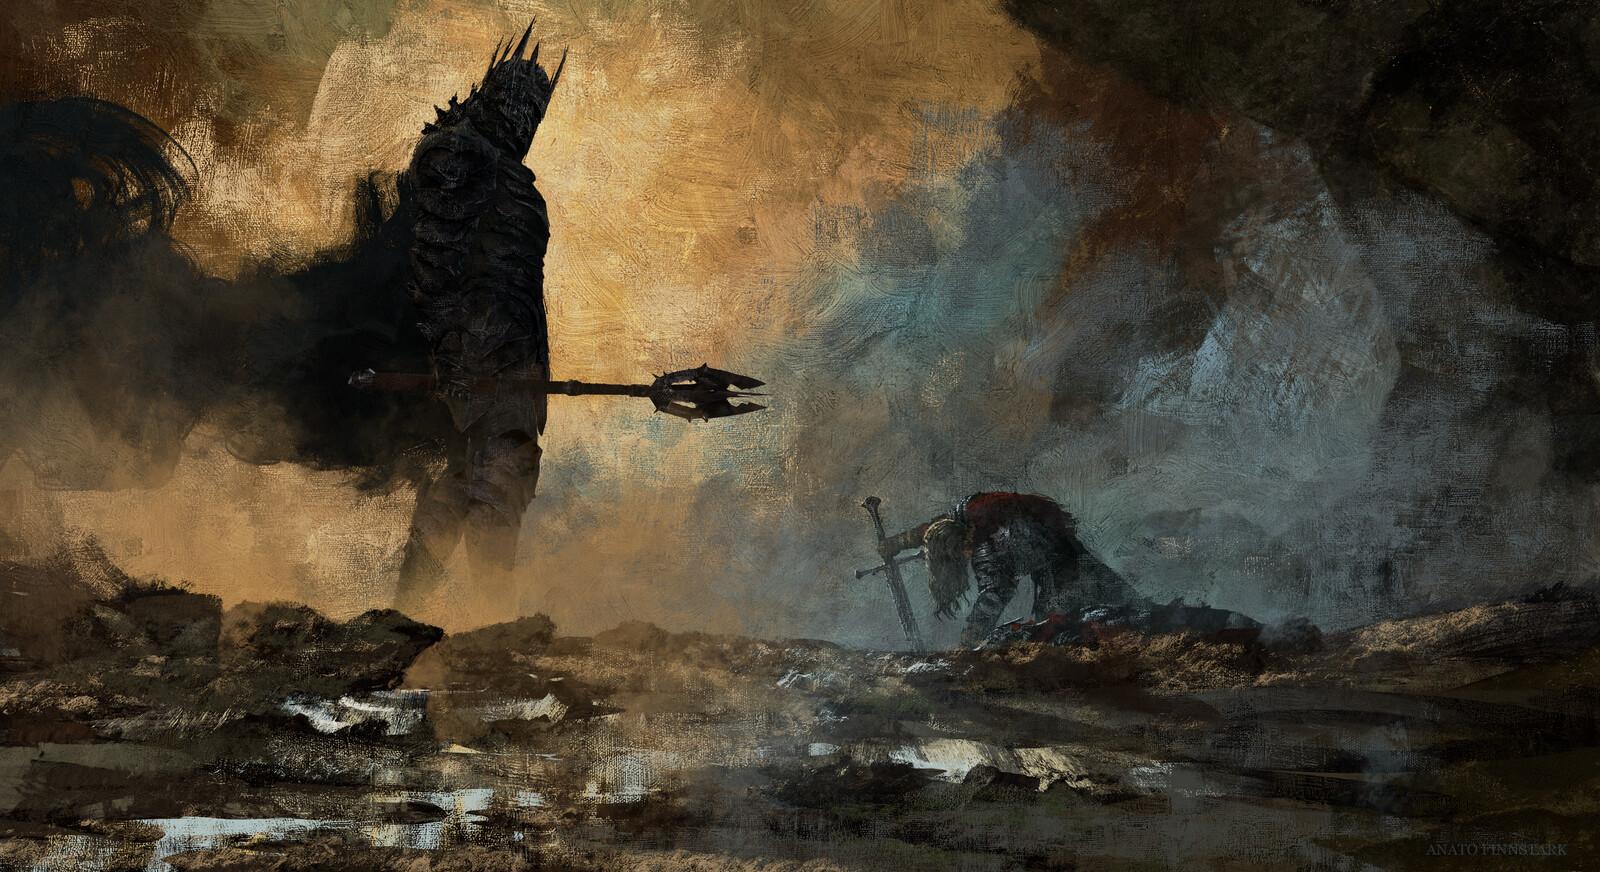 Anato finnstark the fate of isildur the lord of the rings by anatofinnstark dd6ihs6 fullview